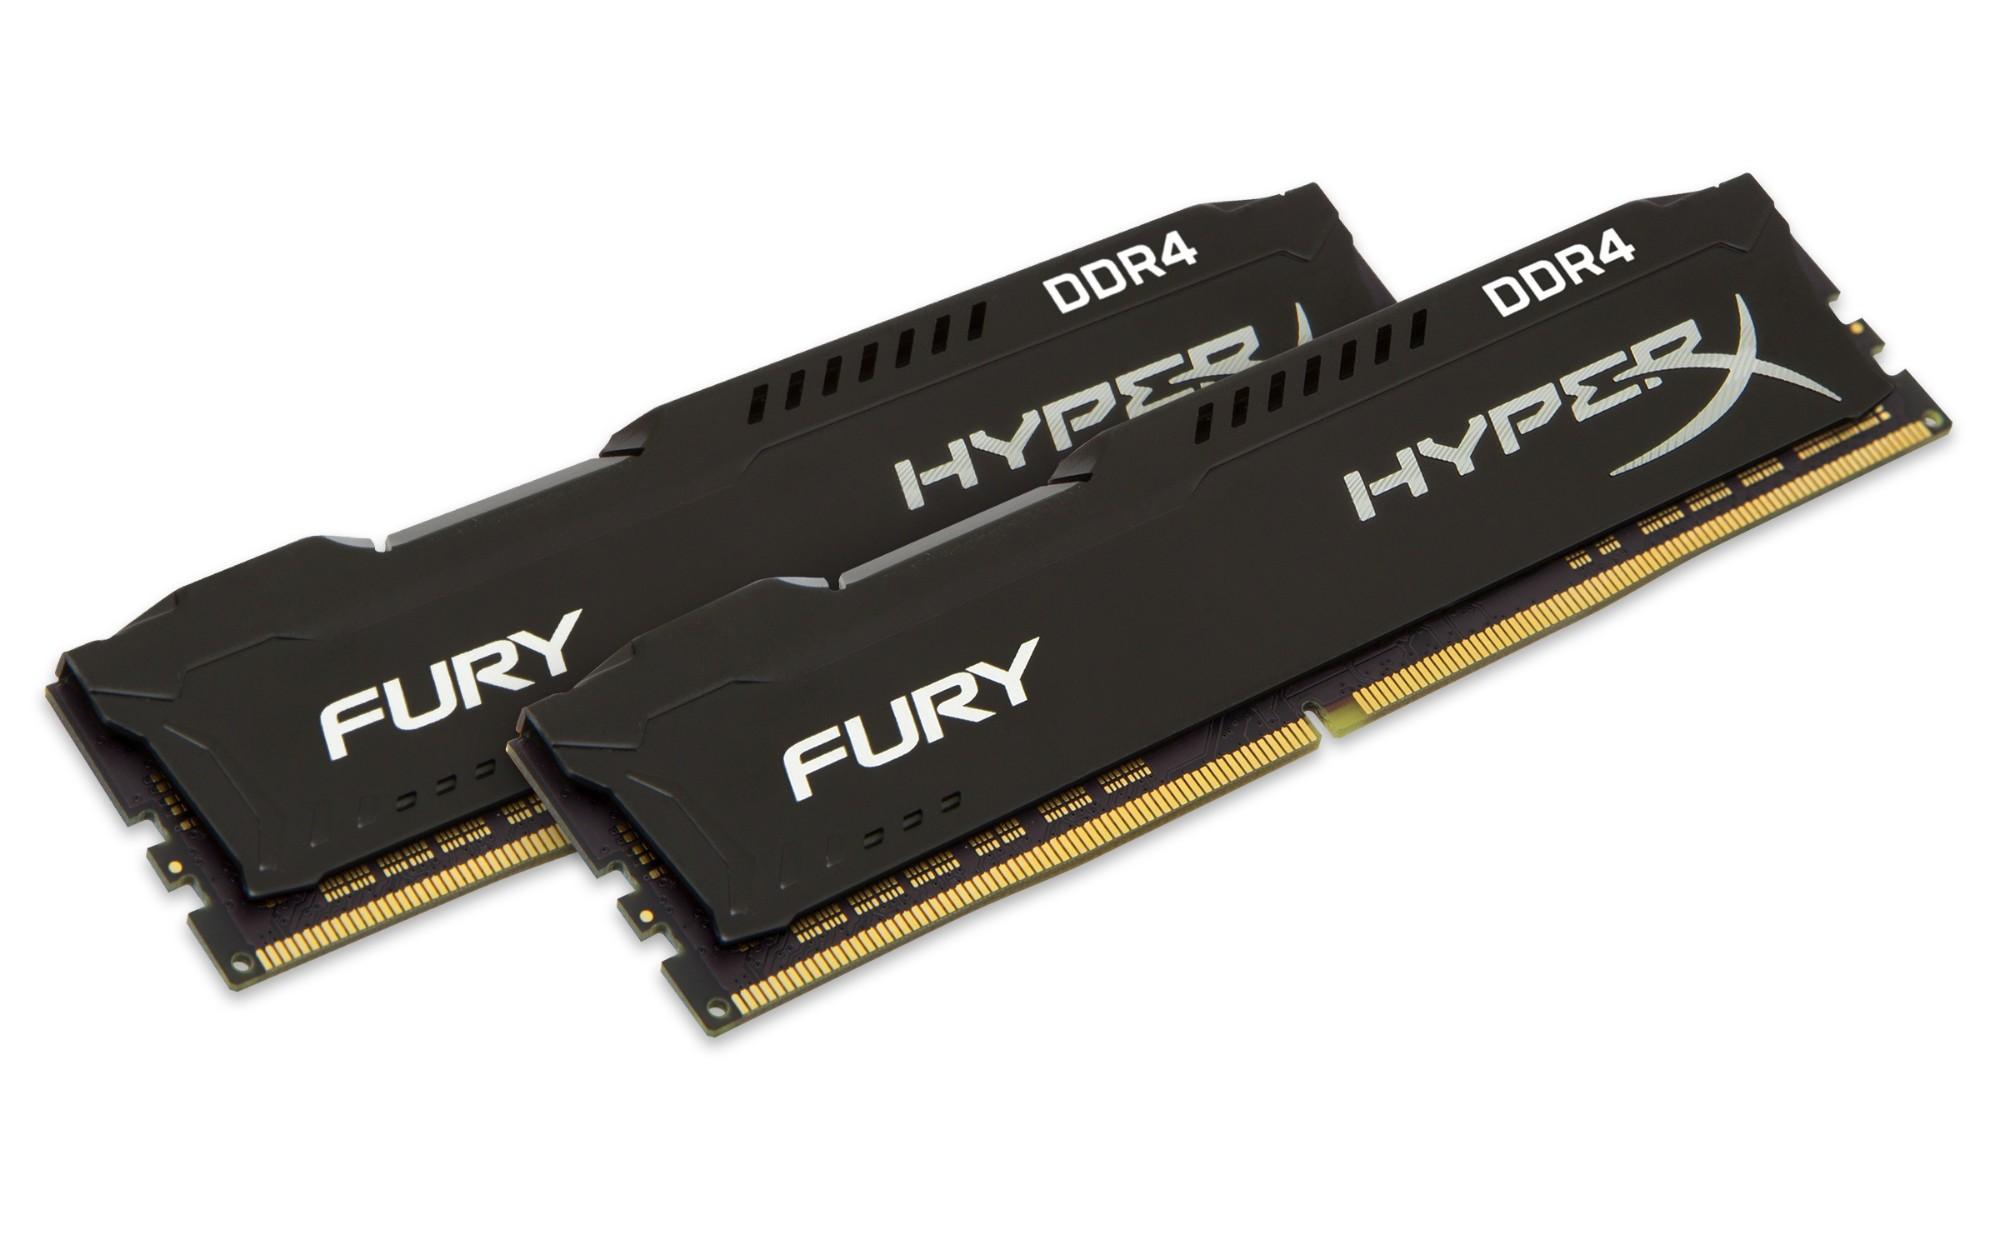 HyperX FURY Memory Black 16GB DDR4 2666MHz Kit 16GB DDR4 2666MHz memory module